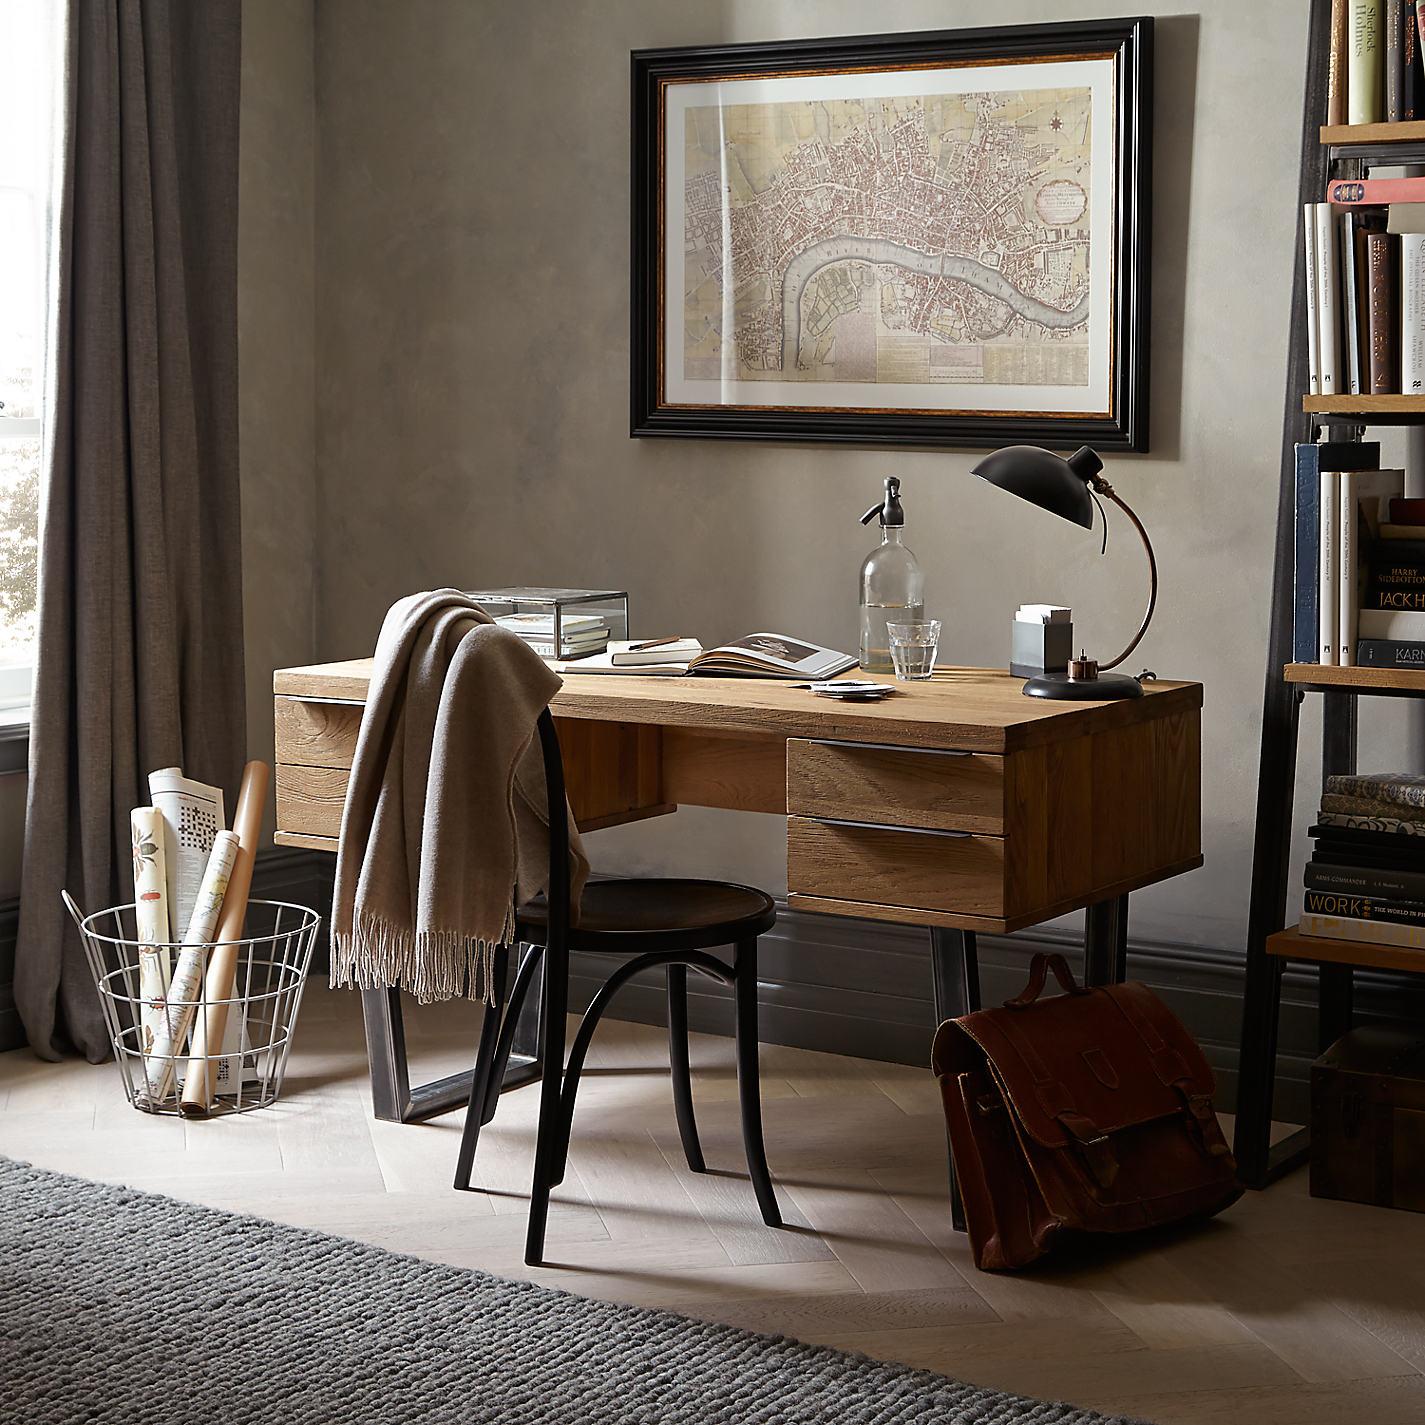 Buy John Lewis Calia Desk Online at johnlewis com. Buy John Lewis Calia Desk   John Lewis